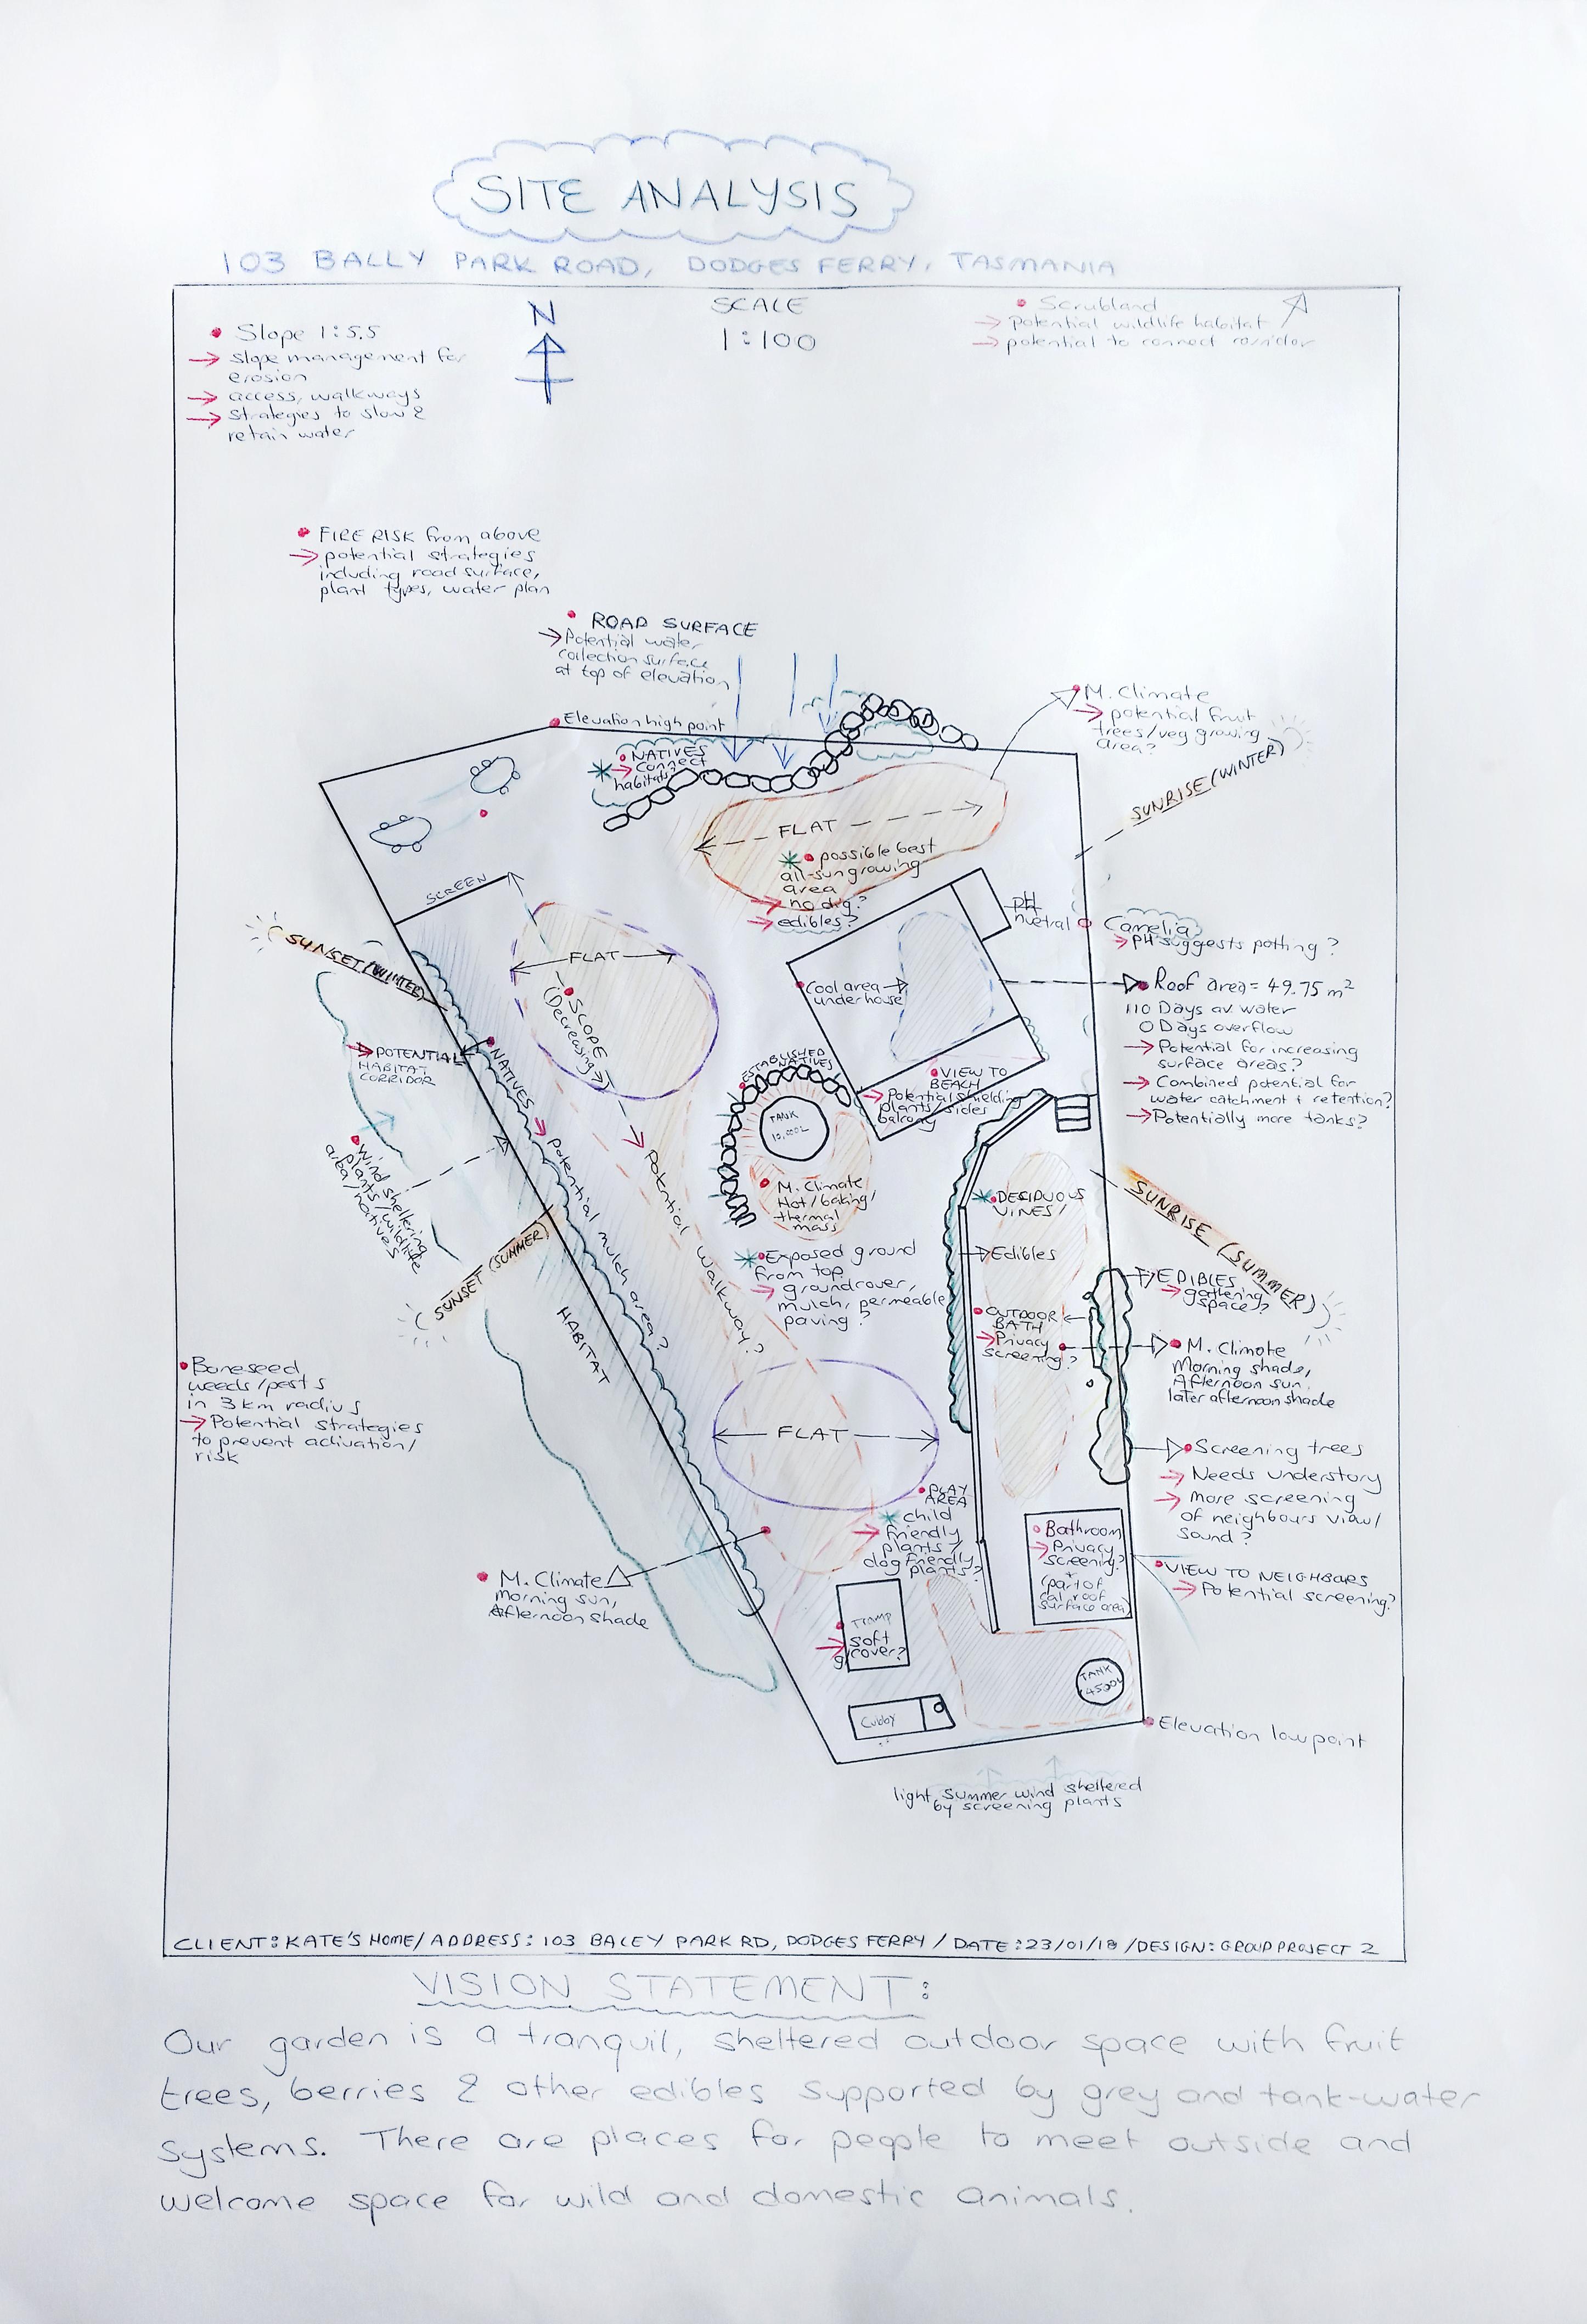 PDC3 – site analysis diagram